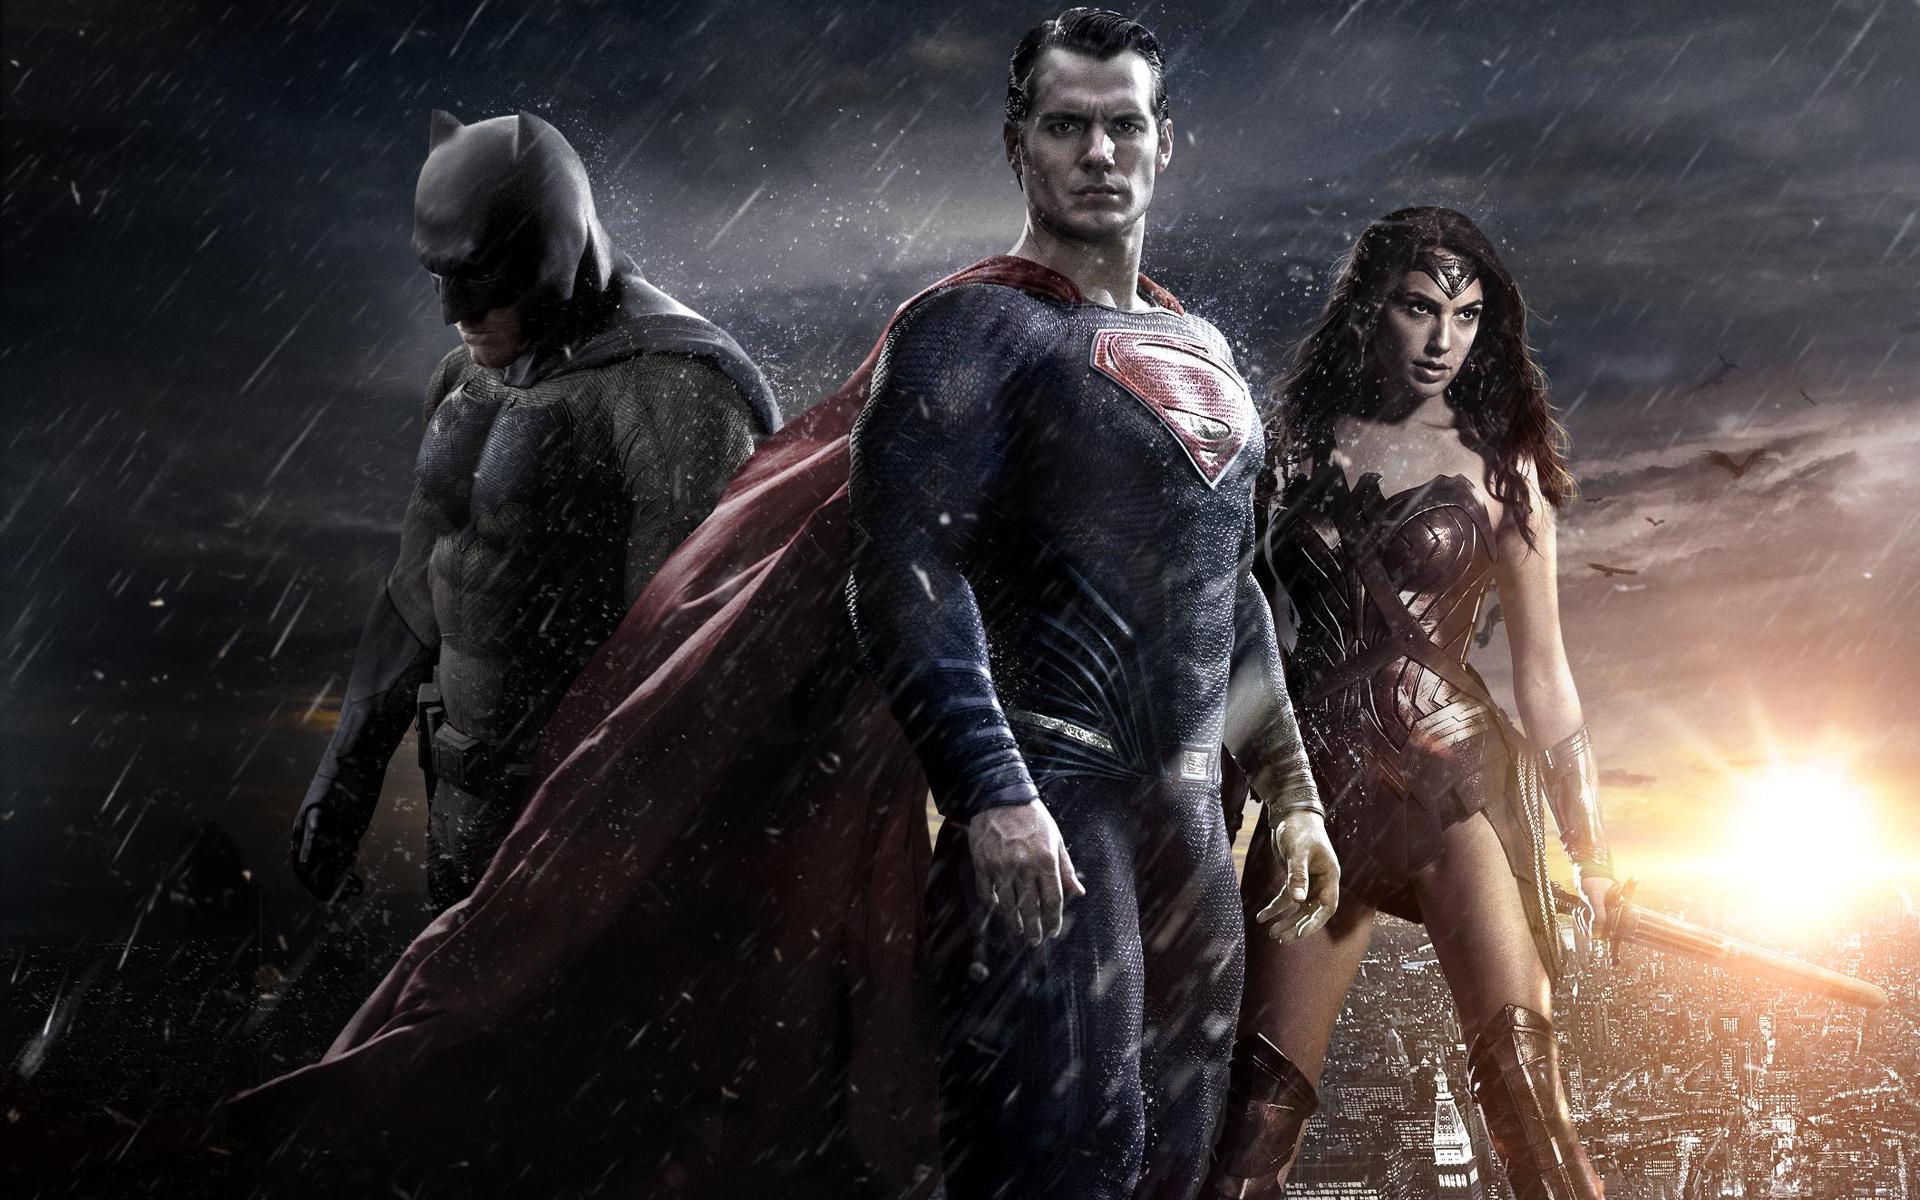 Superman   Wonder Woman   Wallpaper Full HD   1920x1200   Select Game 1920x1200